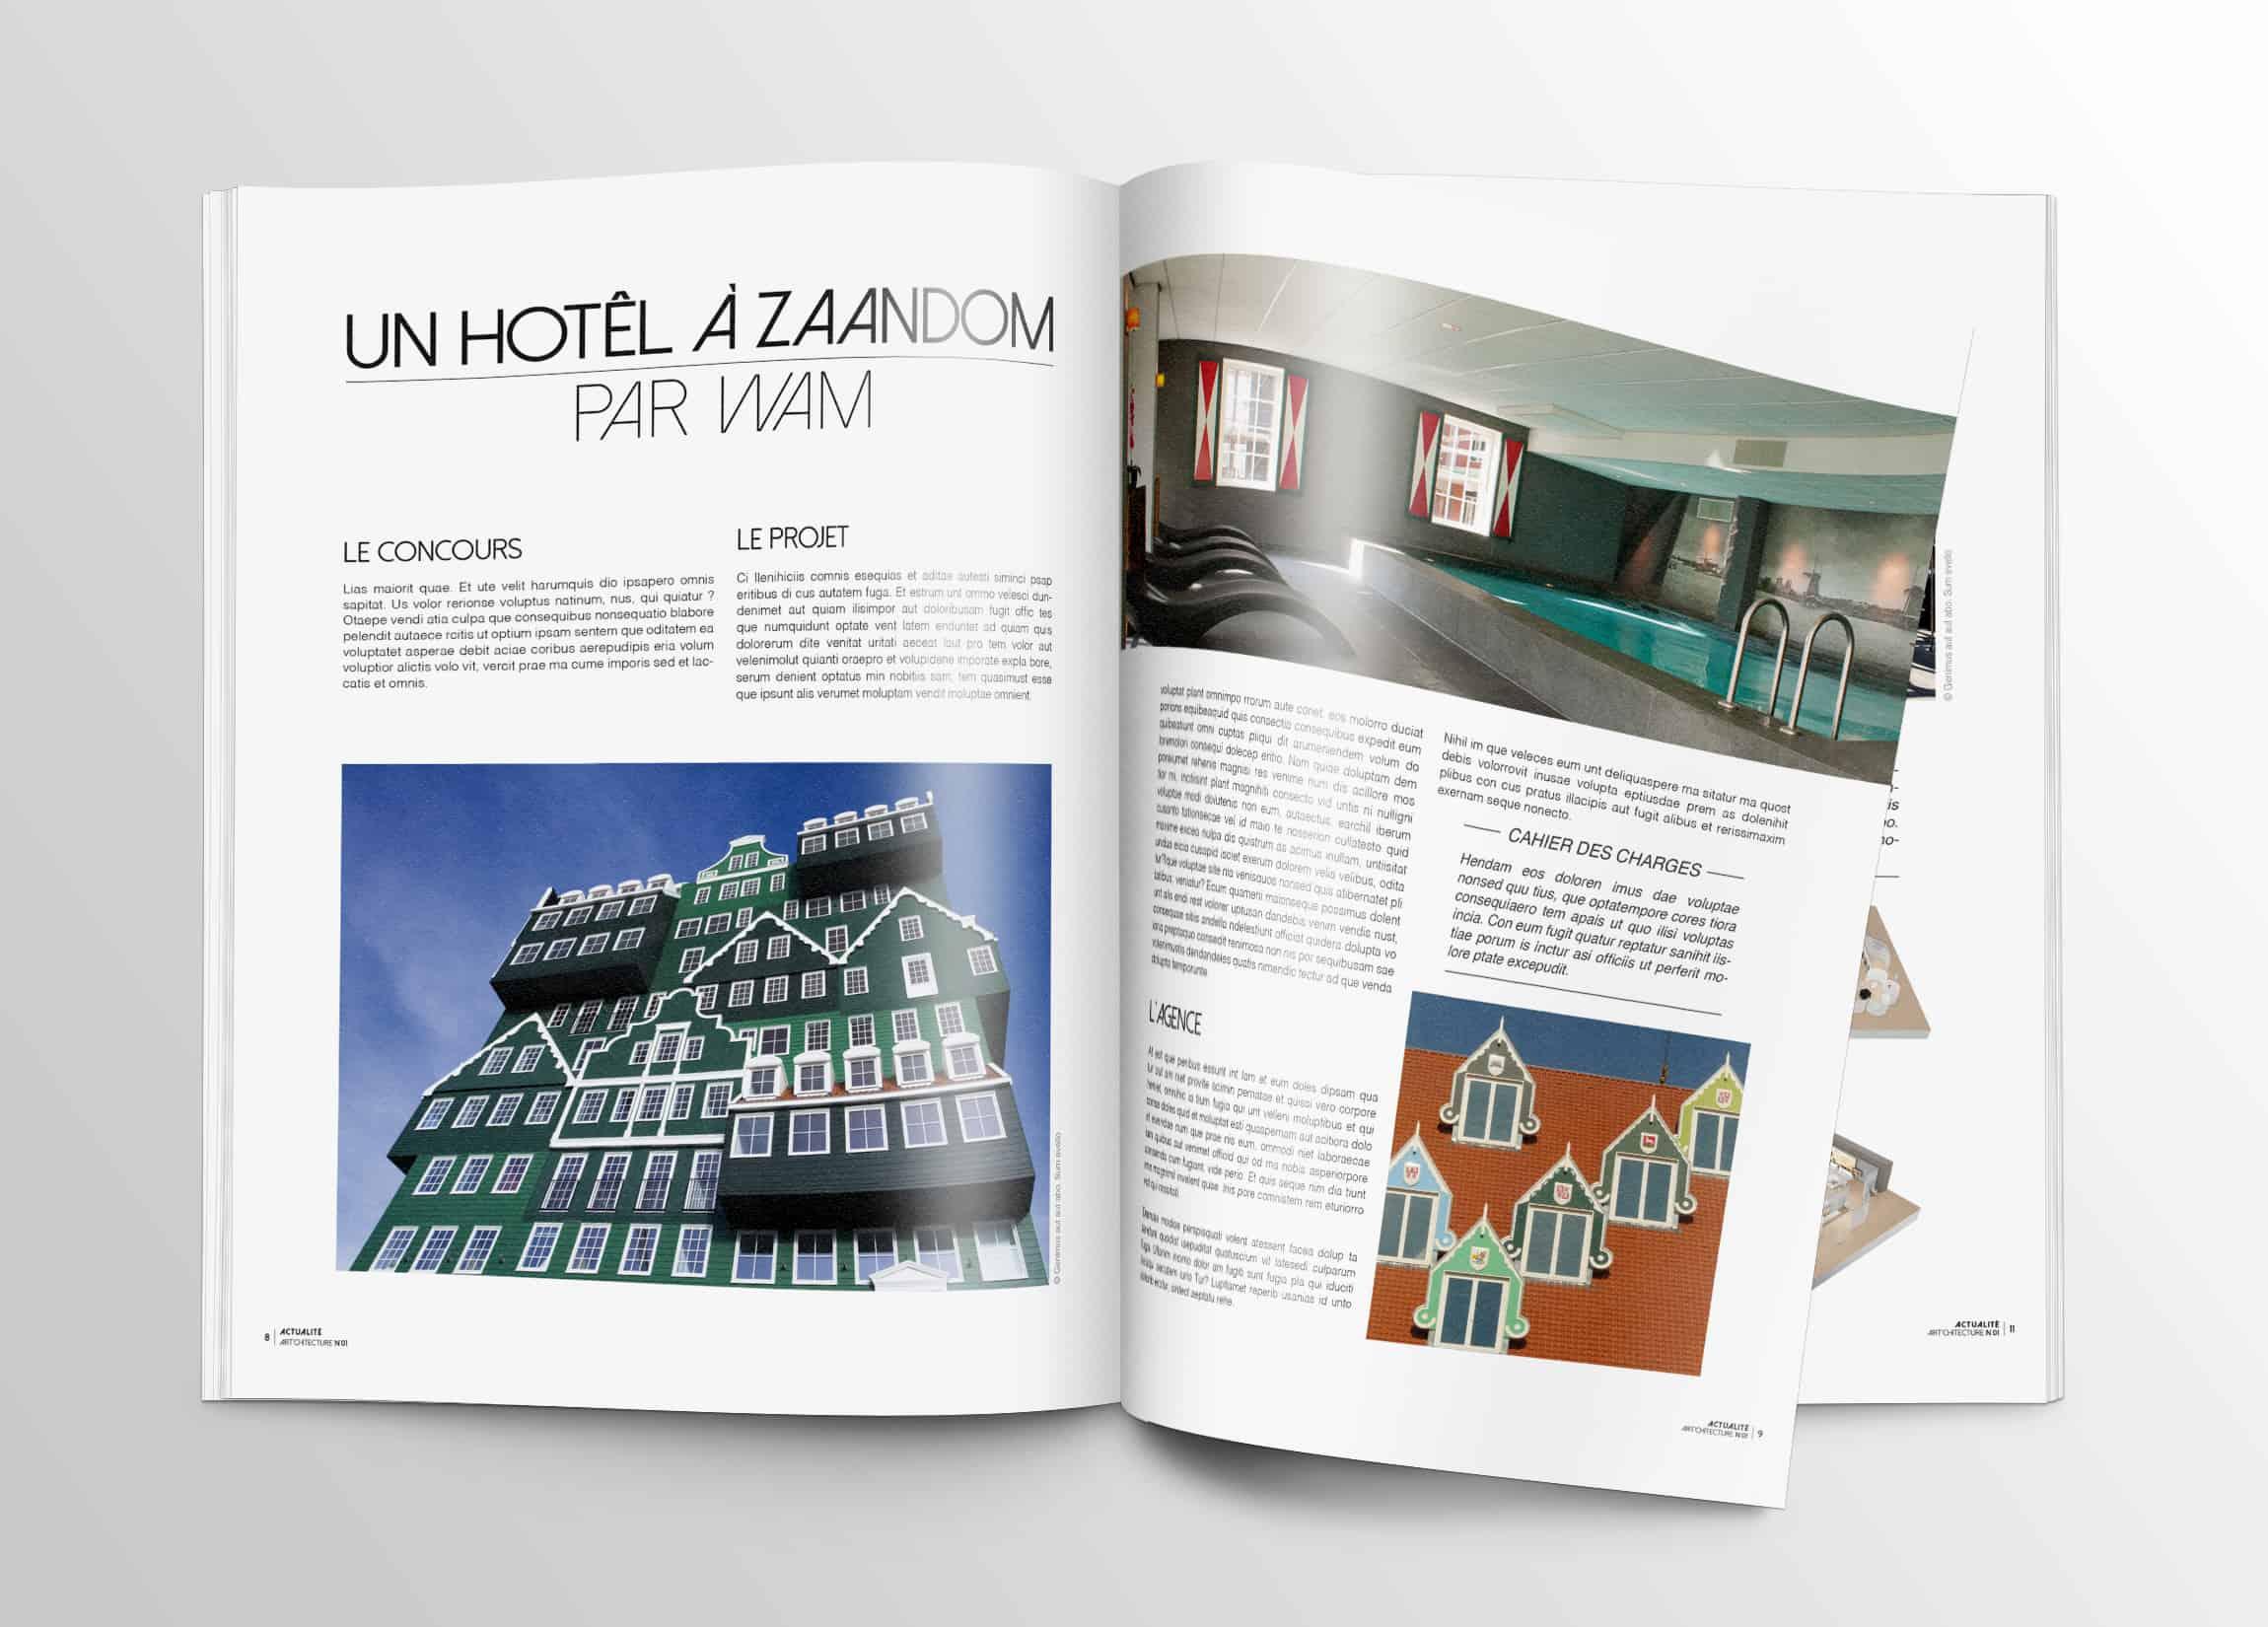 couverture-magazine-darchitecture-double-page-edition-graphisme-minimaliste